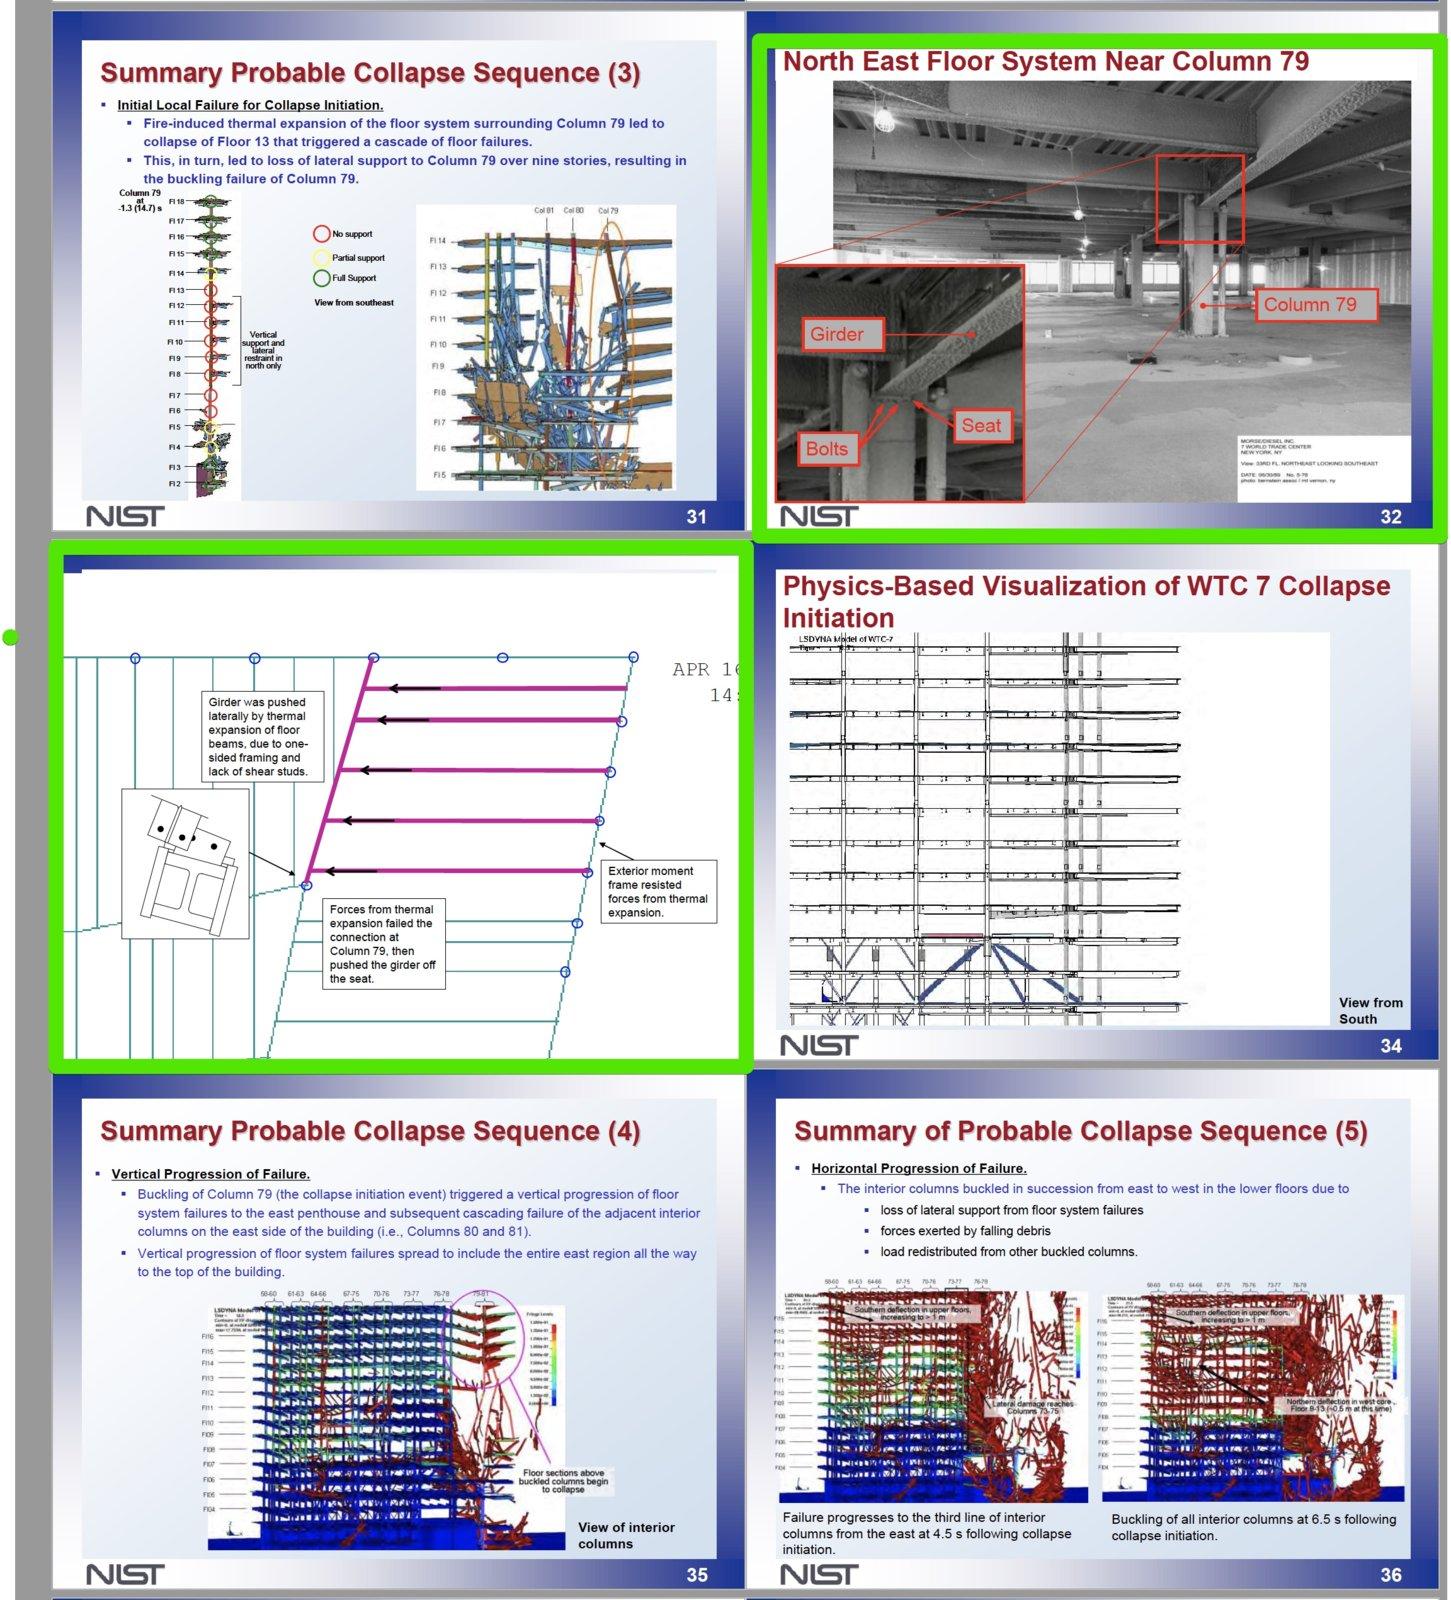 WTC7RevisedTechnicalBriefing_111908.pdf 2018-01-16 09-14-00.jpg